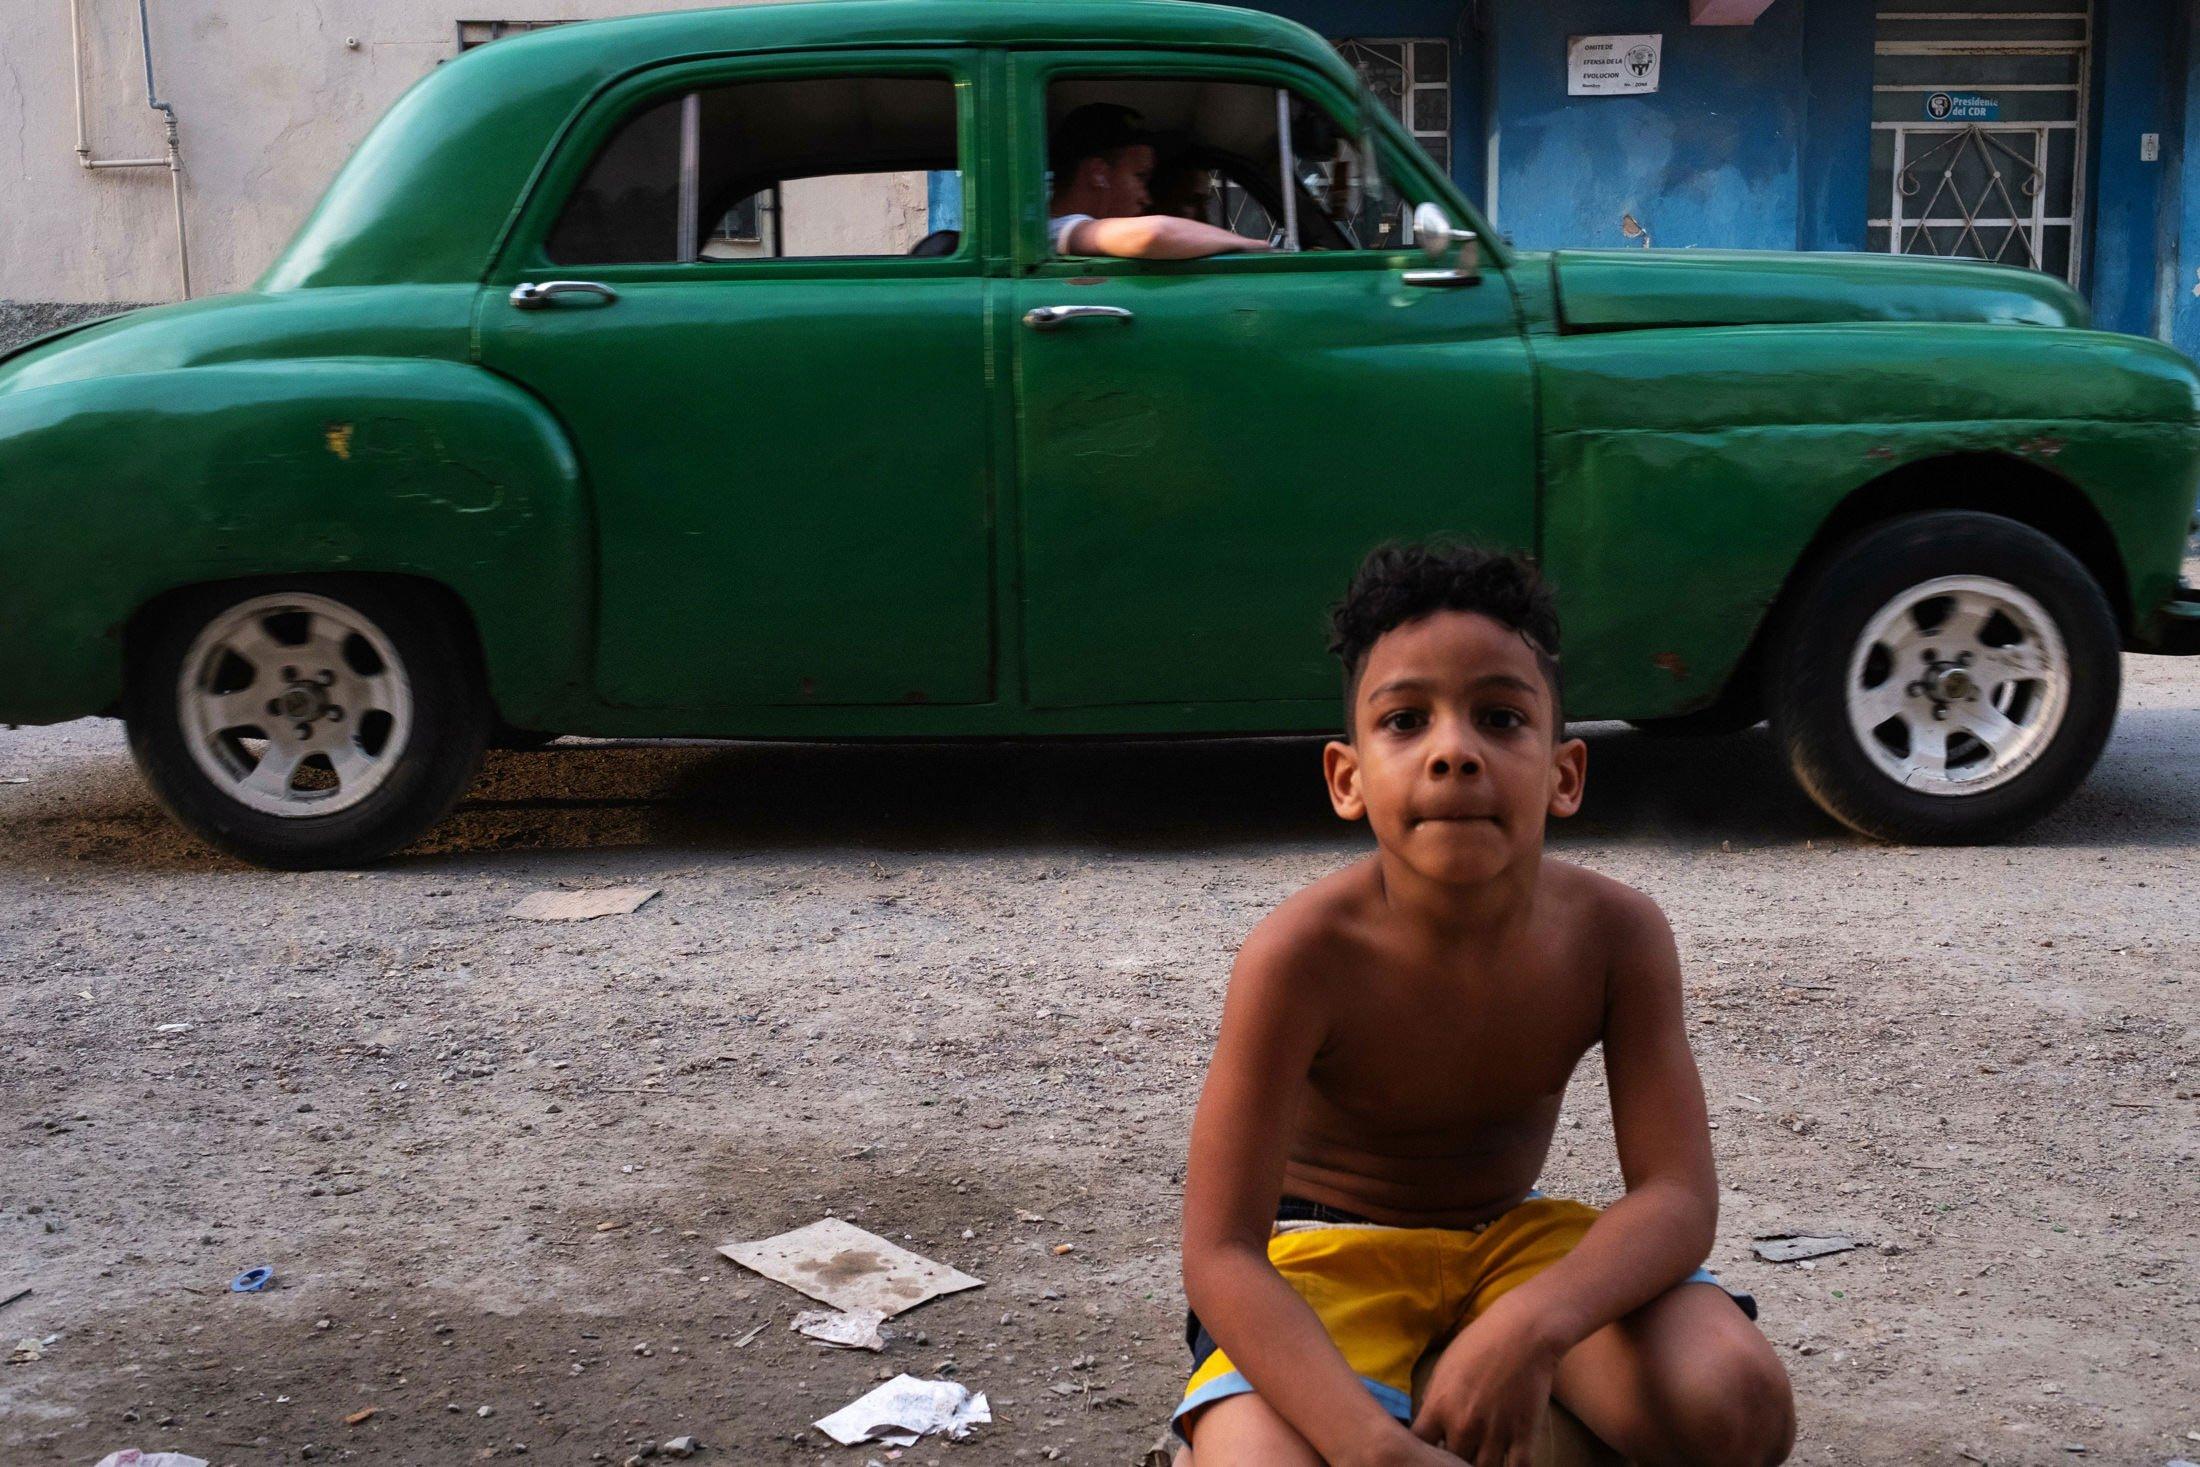 portrait of a boy sat next to a green cuban car